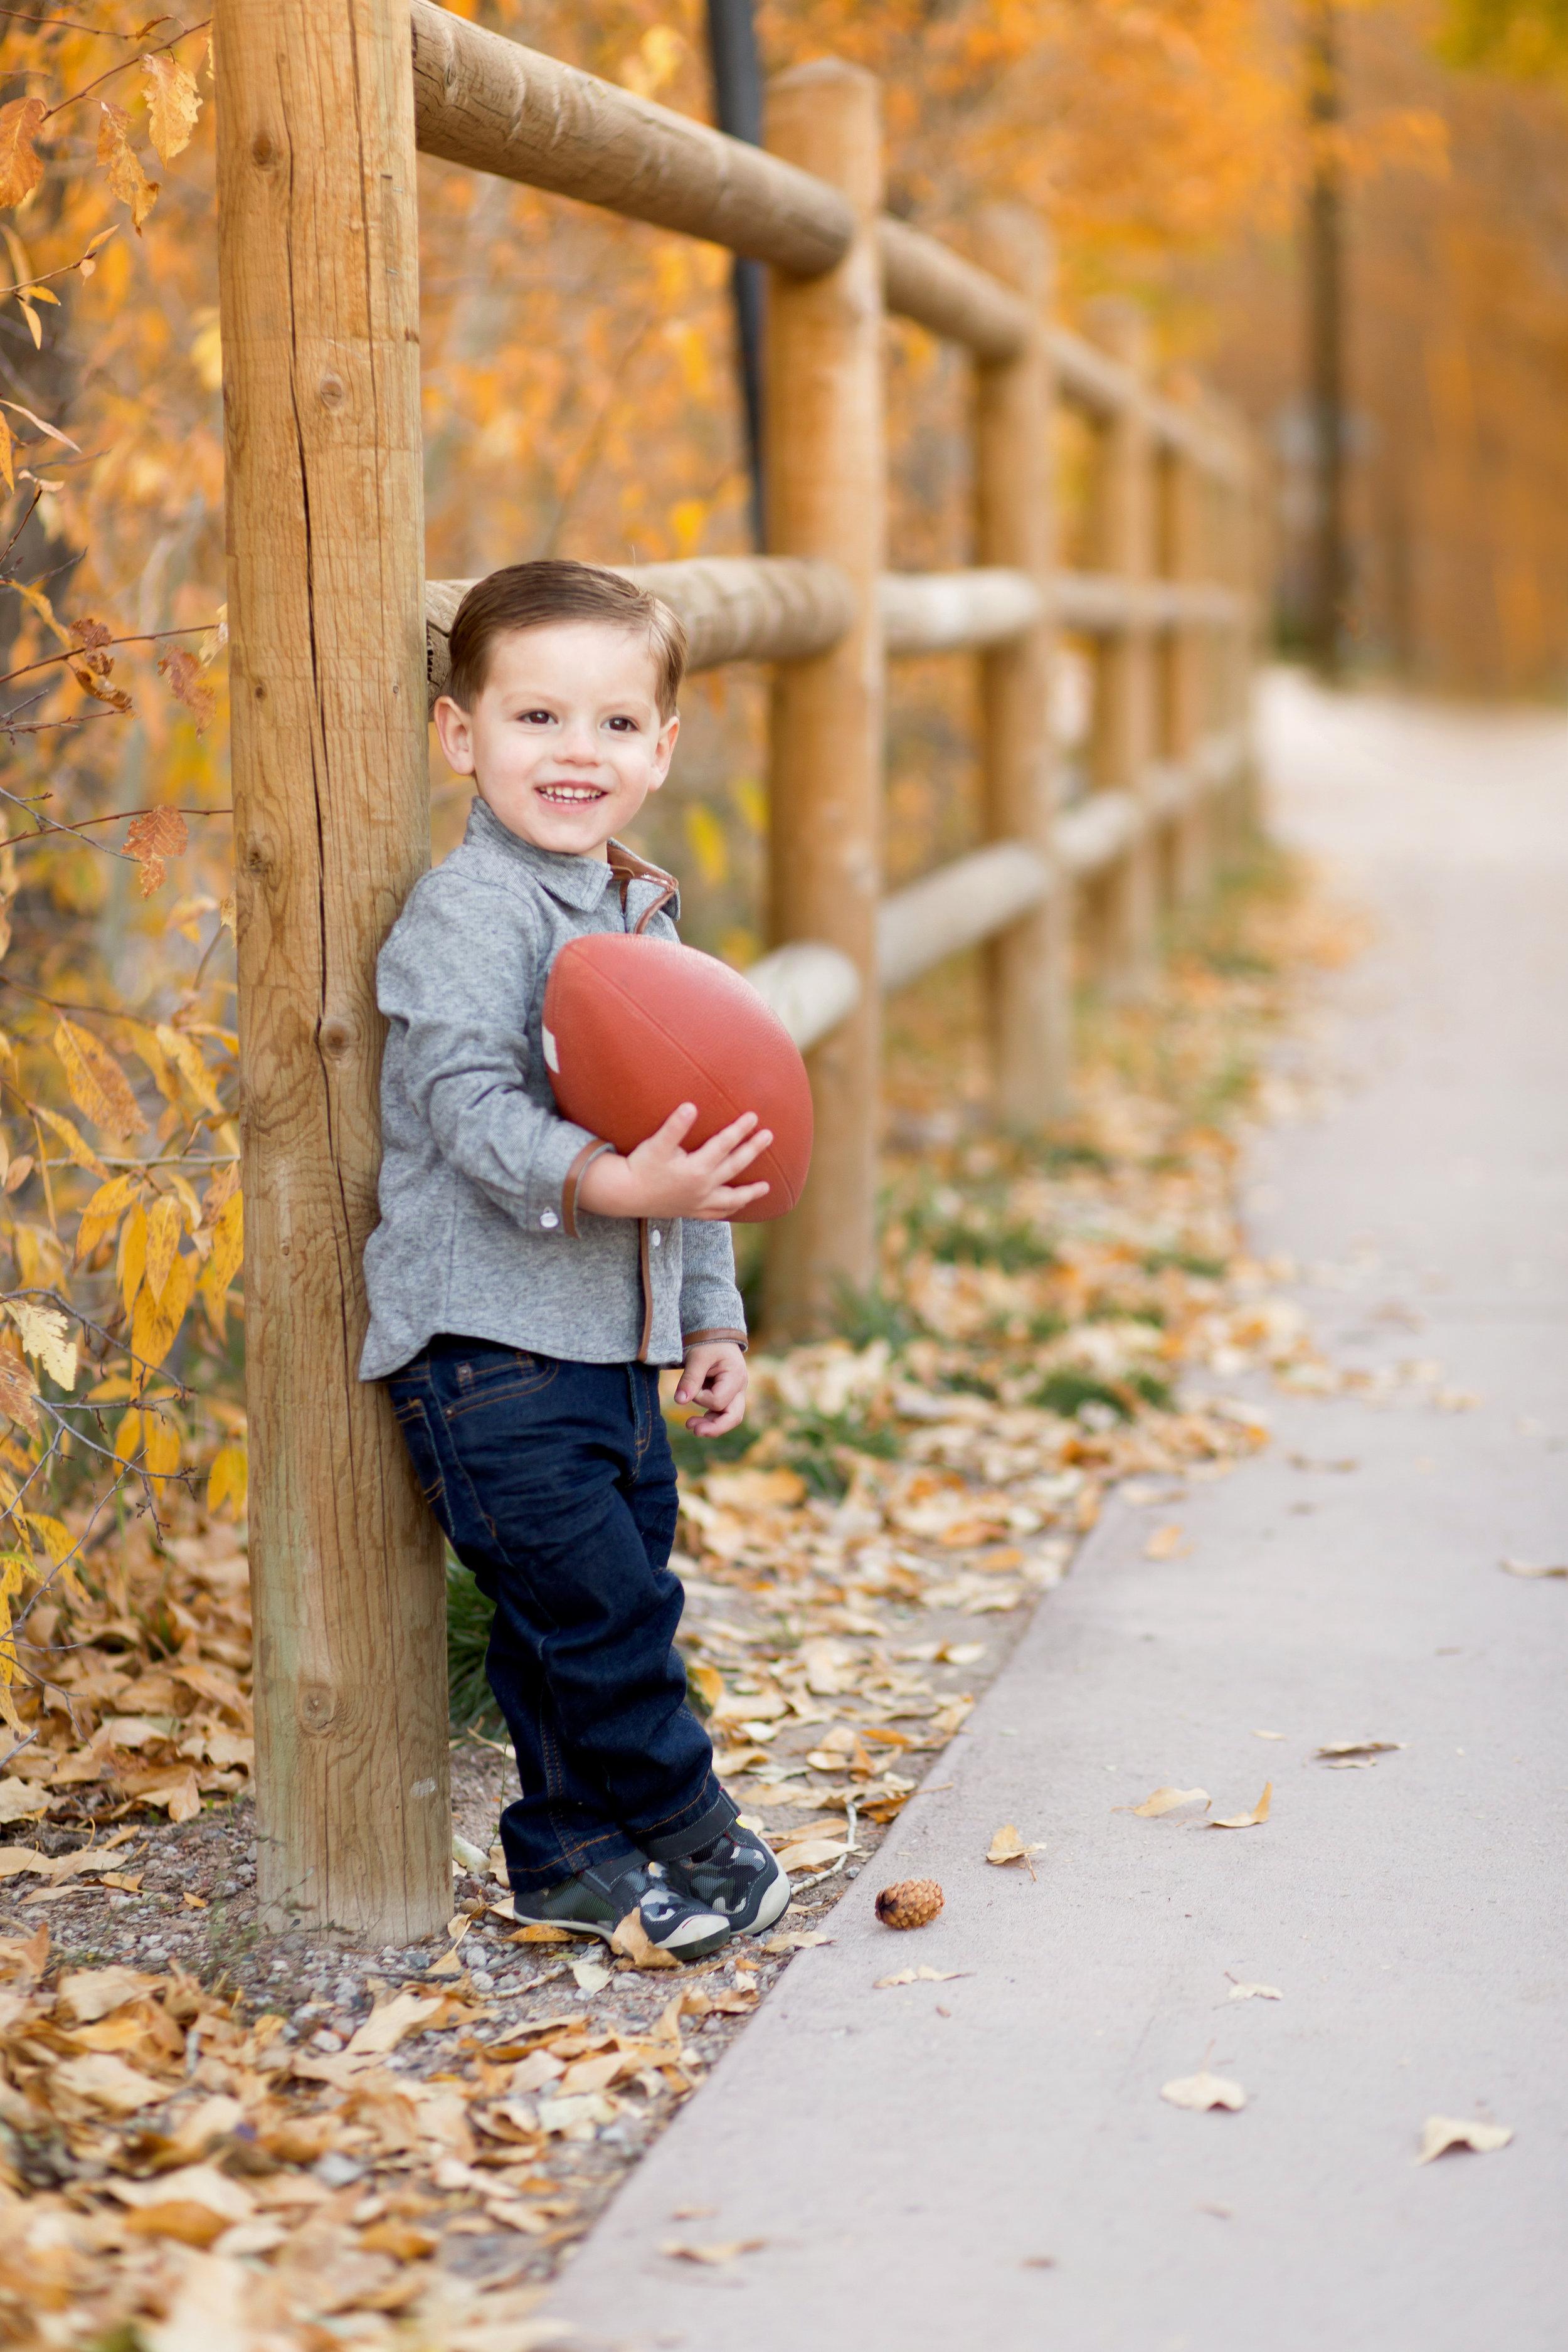 Denver Maternity Photographer, Boulder Maternity Photographer, Boulder Newborn Photographer, Denver Newborn Photographer